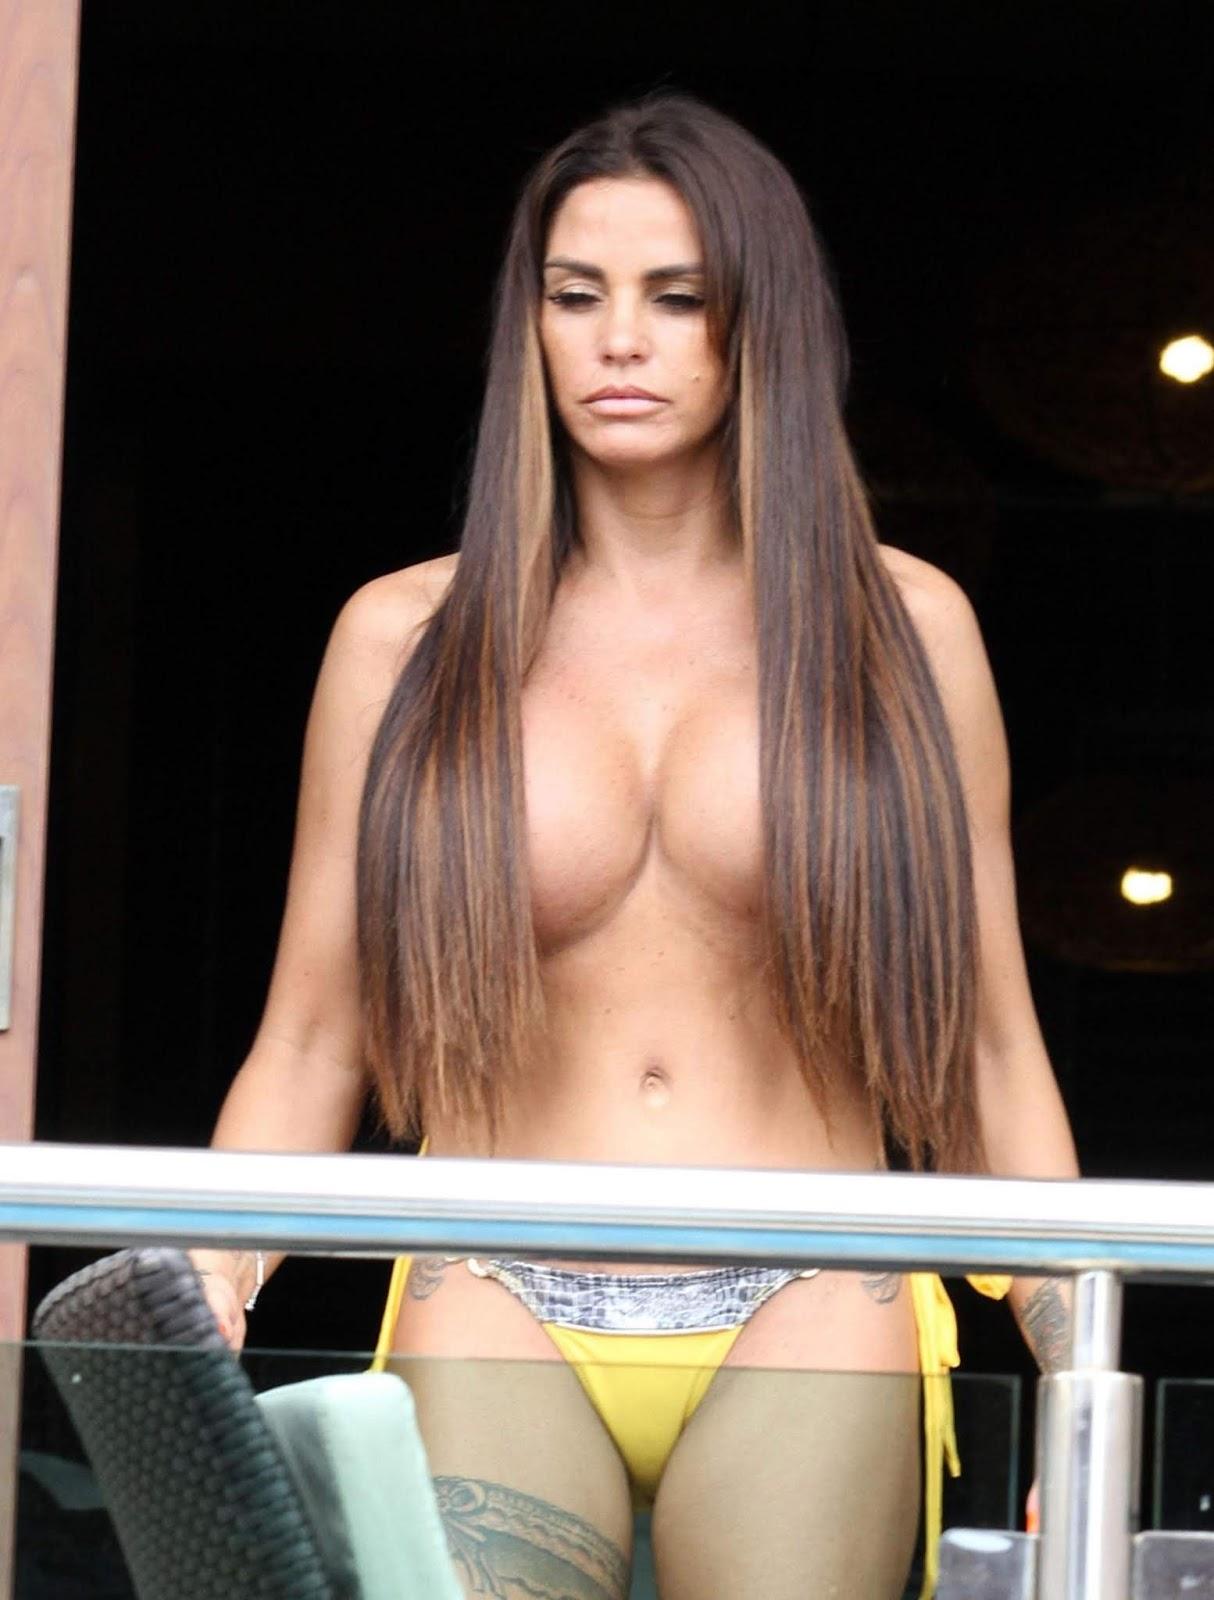 Angelique Pettyjohn Topless katie price topless poolside photoshoot in thailand – celeb